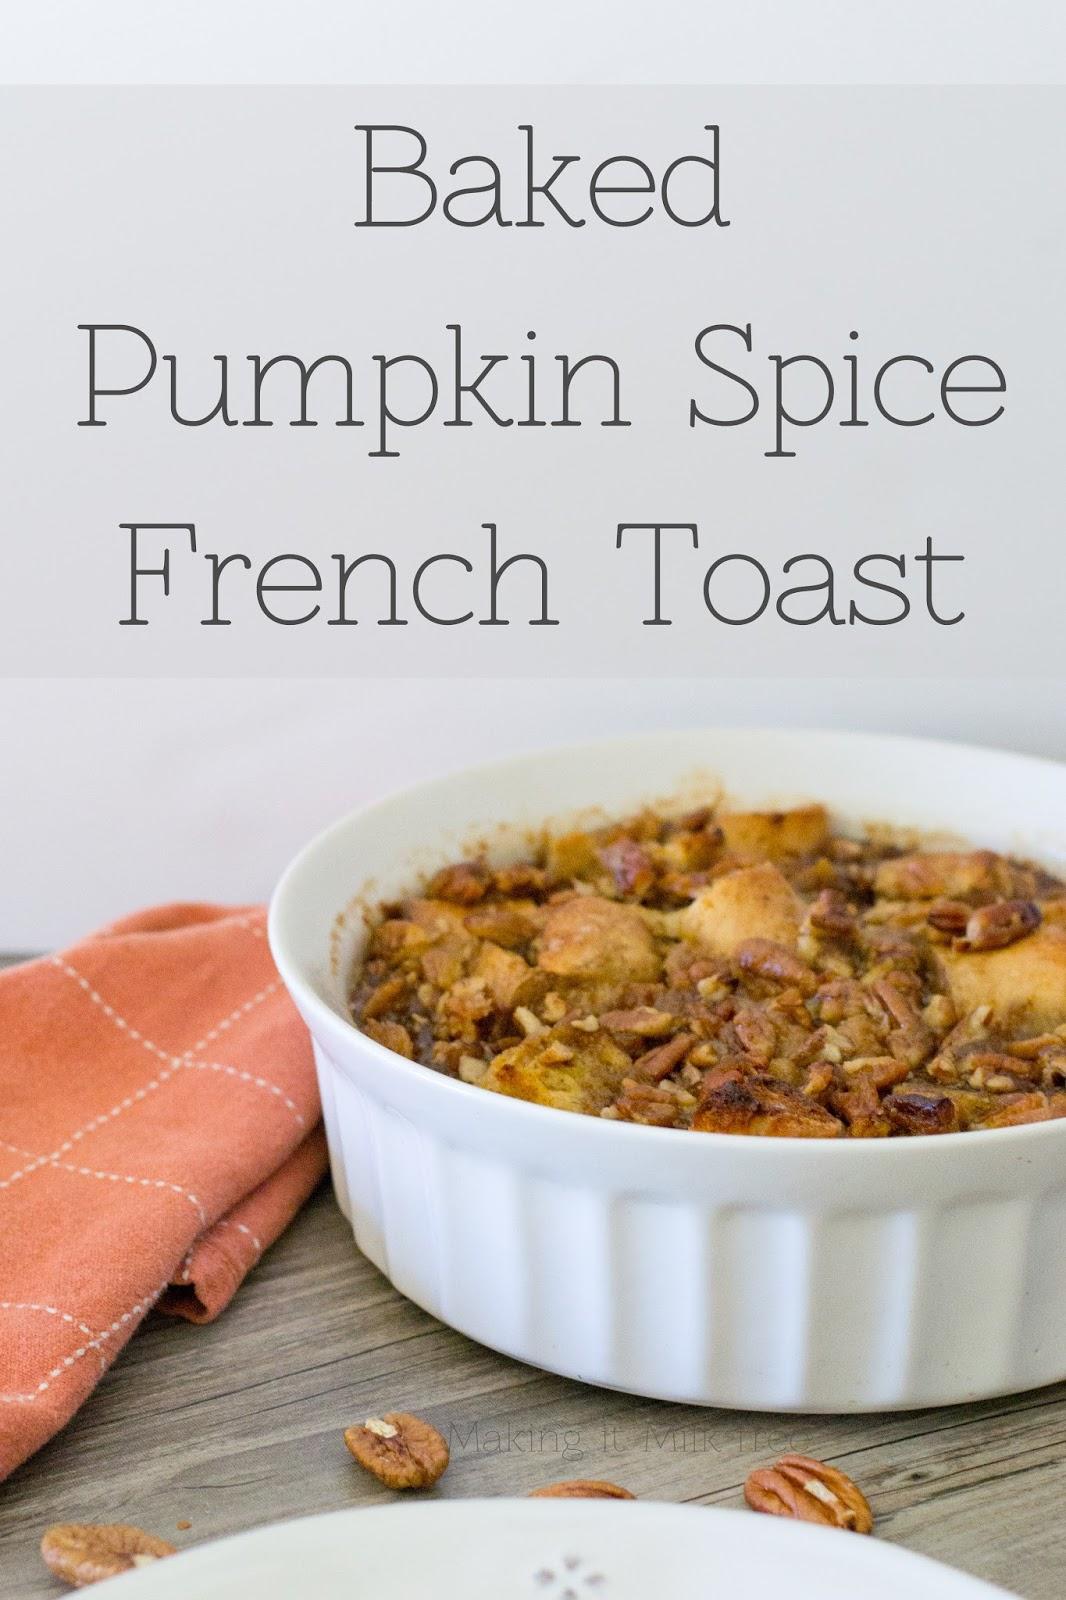 #glutenfree #dairyfree #frenchtoast #breakfast #pumpkinspice